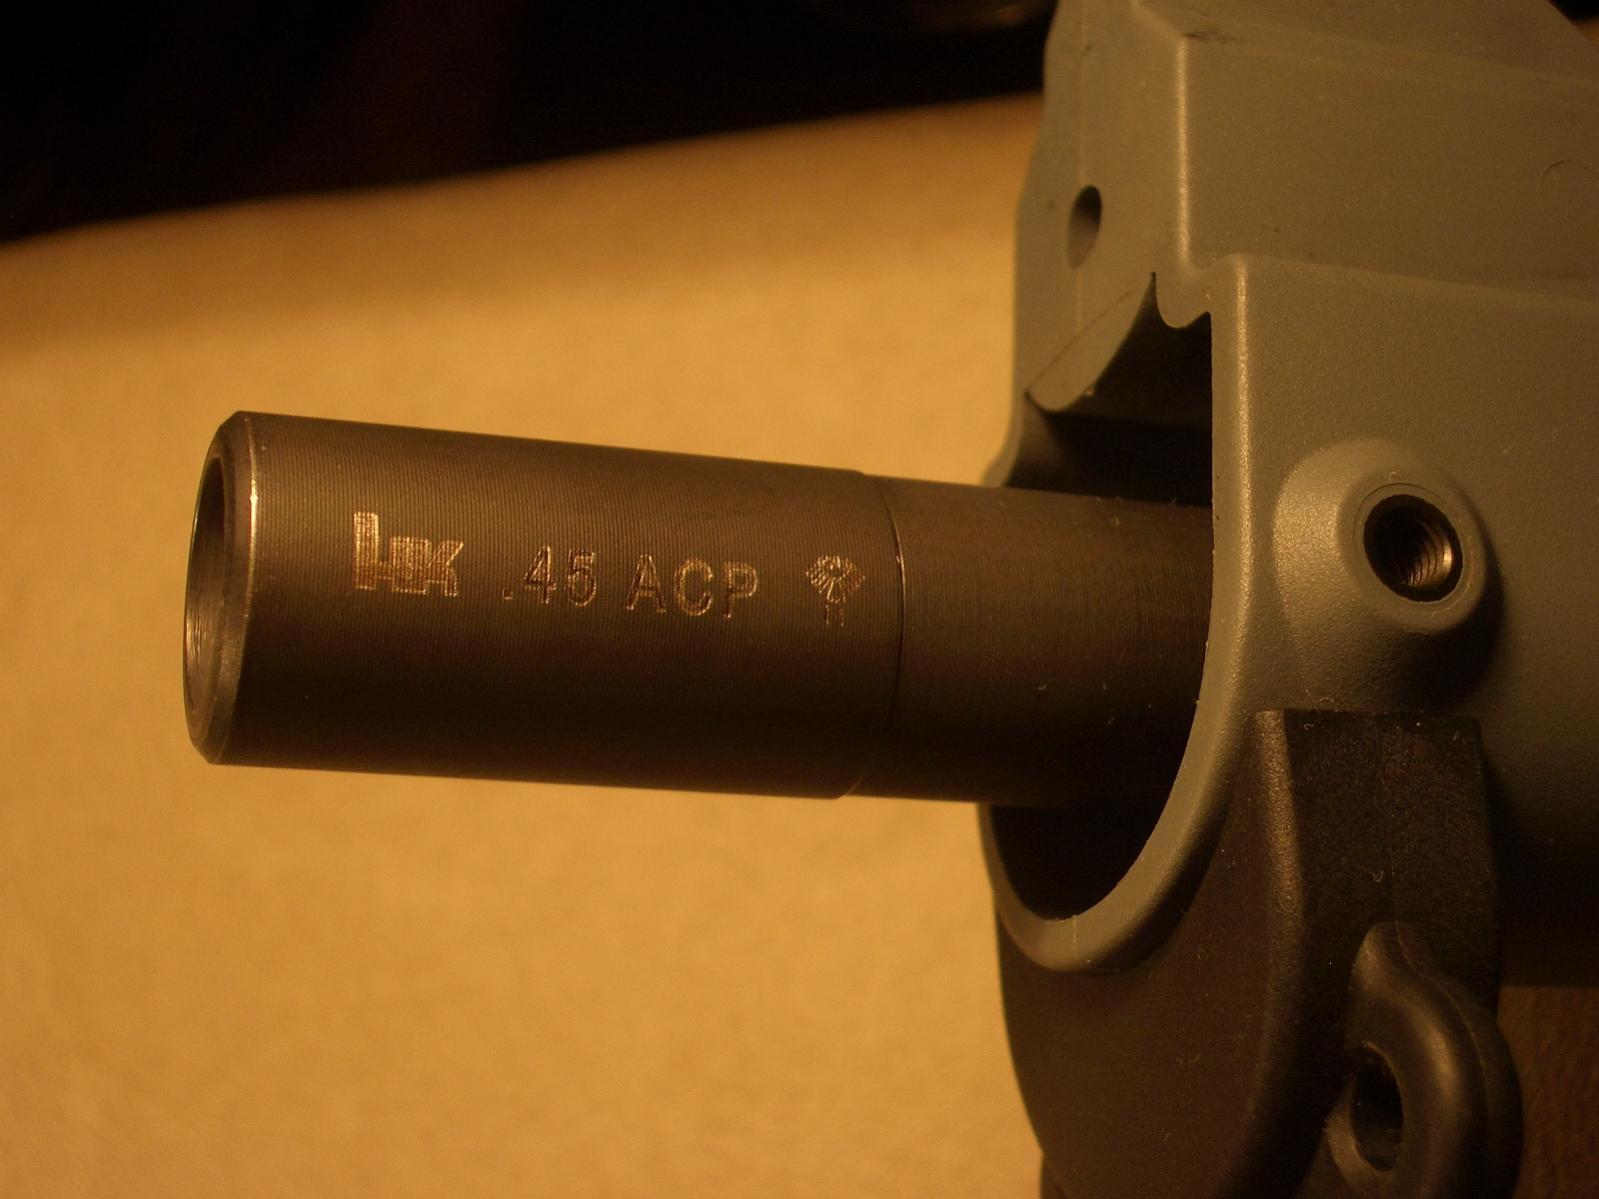 SBR'd Gray USC-imgp3062.jpg